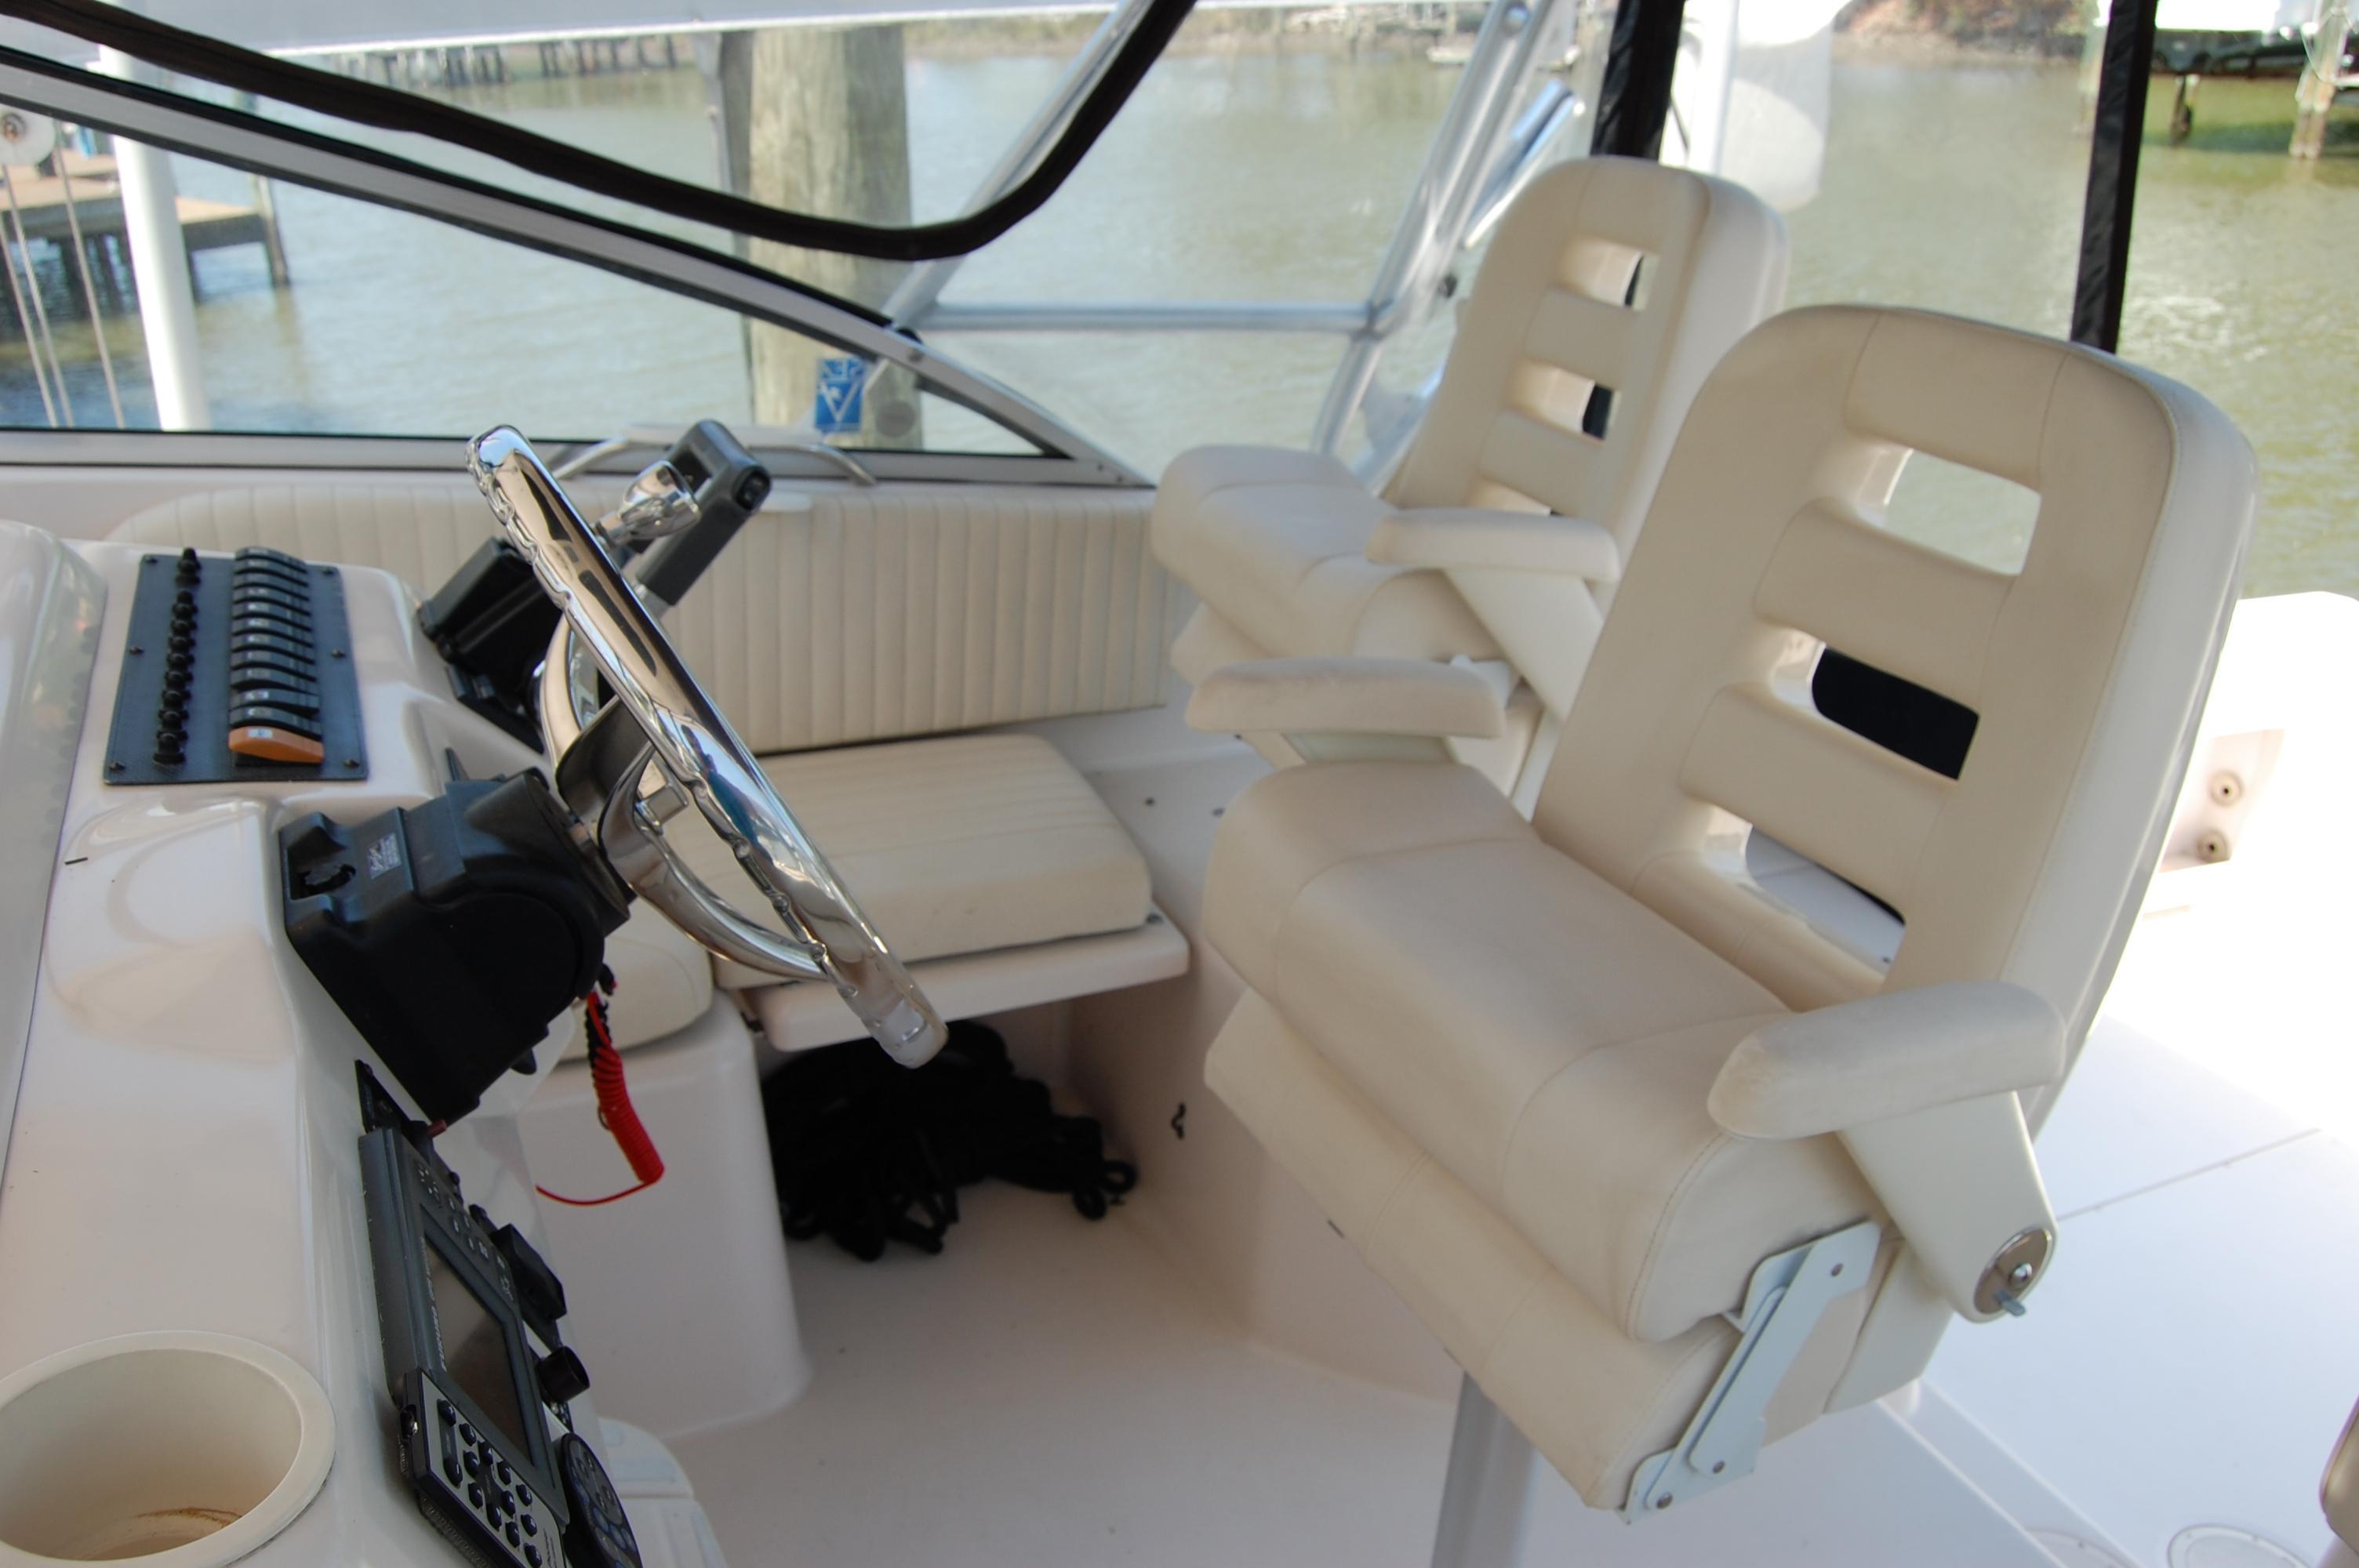 2002 Grady White 330 Express, (2) Pompanette helm chairs (flip-up bolsters, folding armrests)